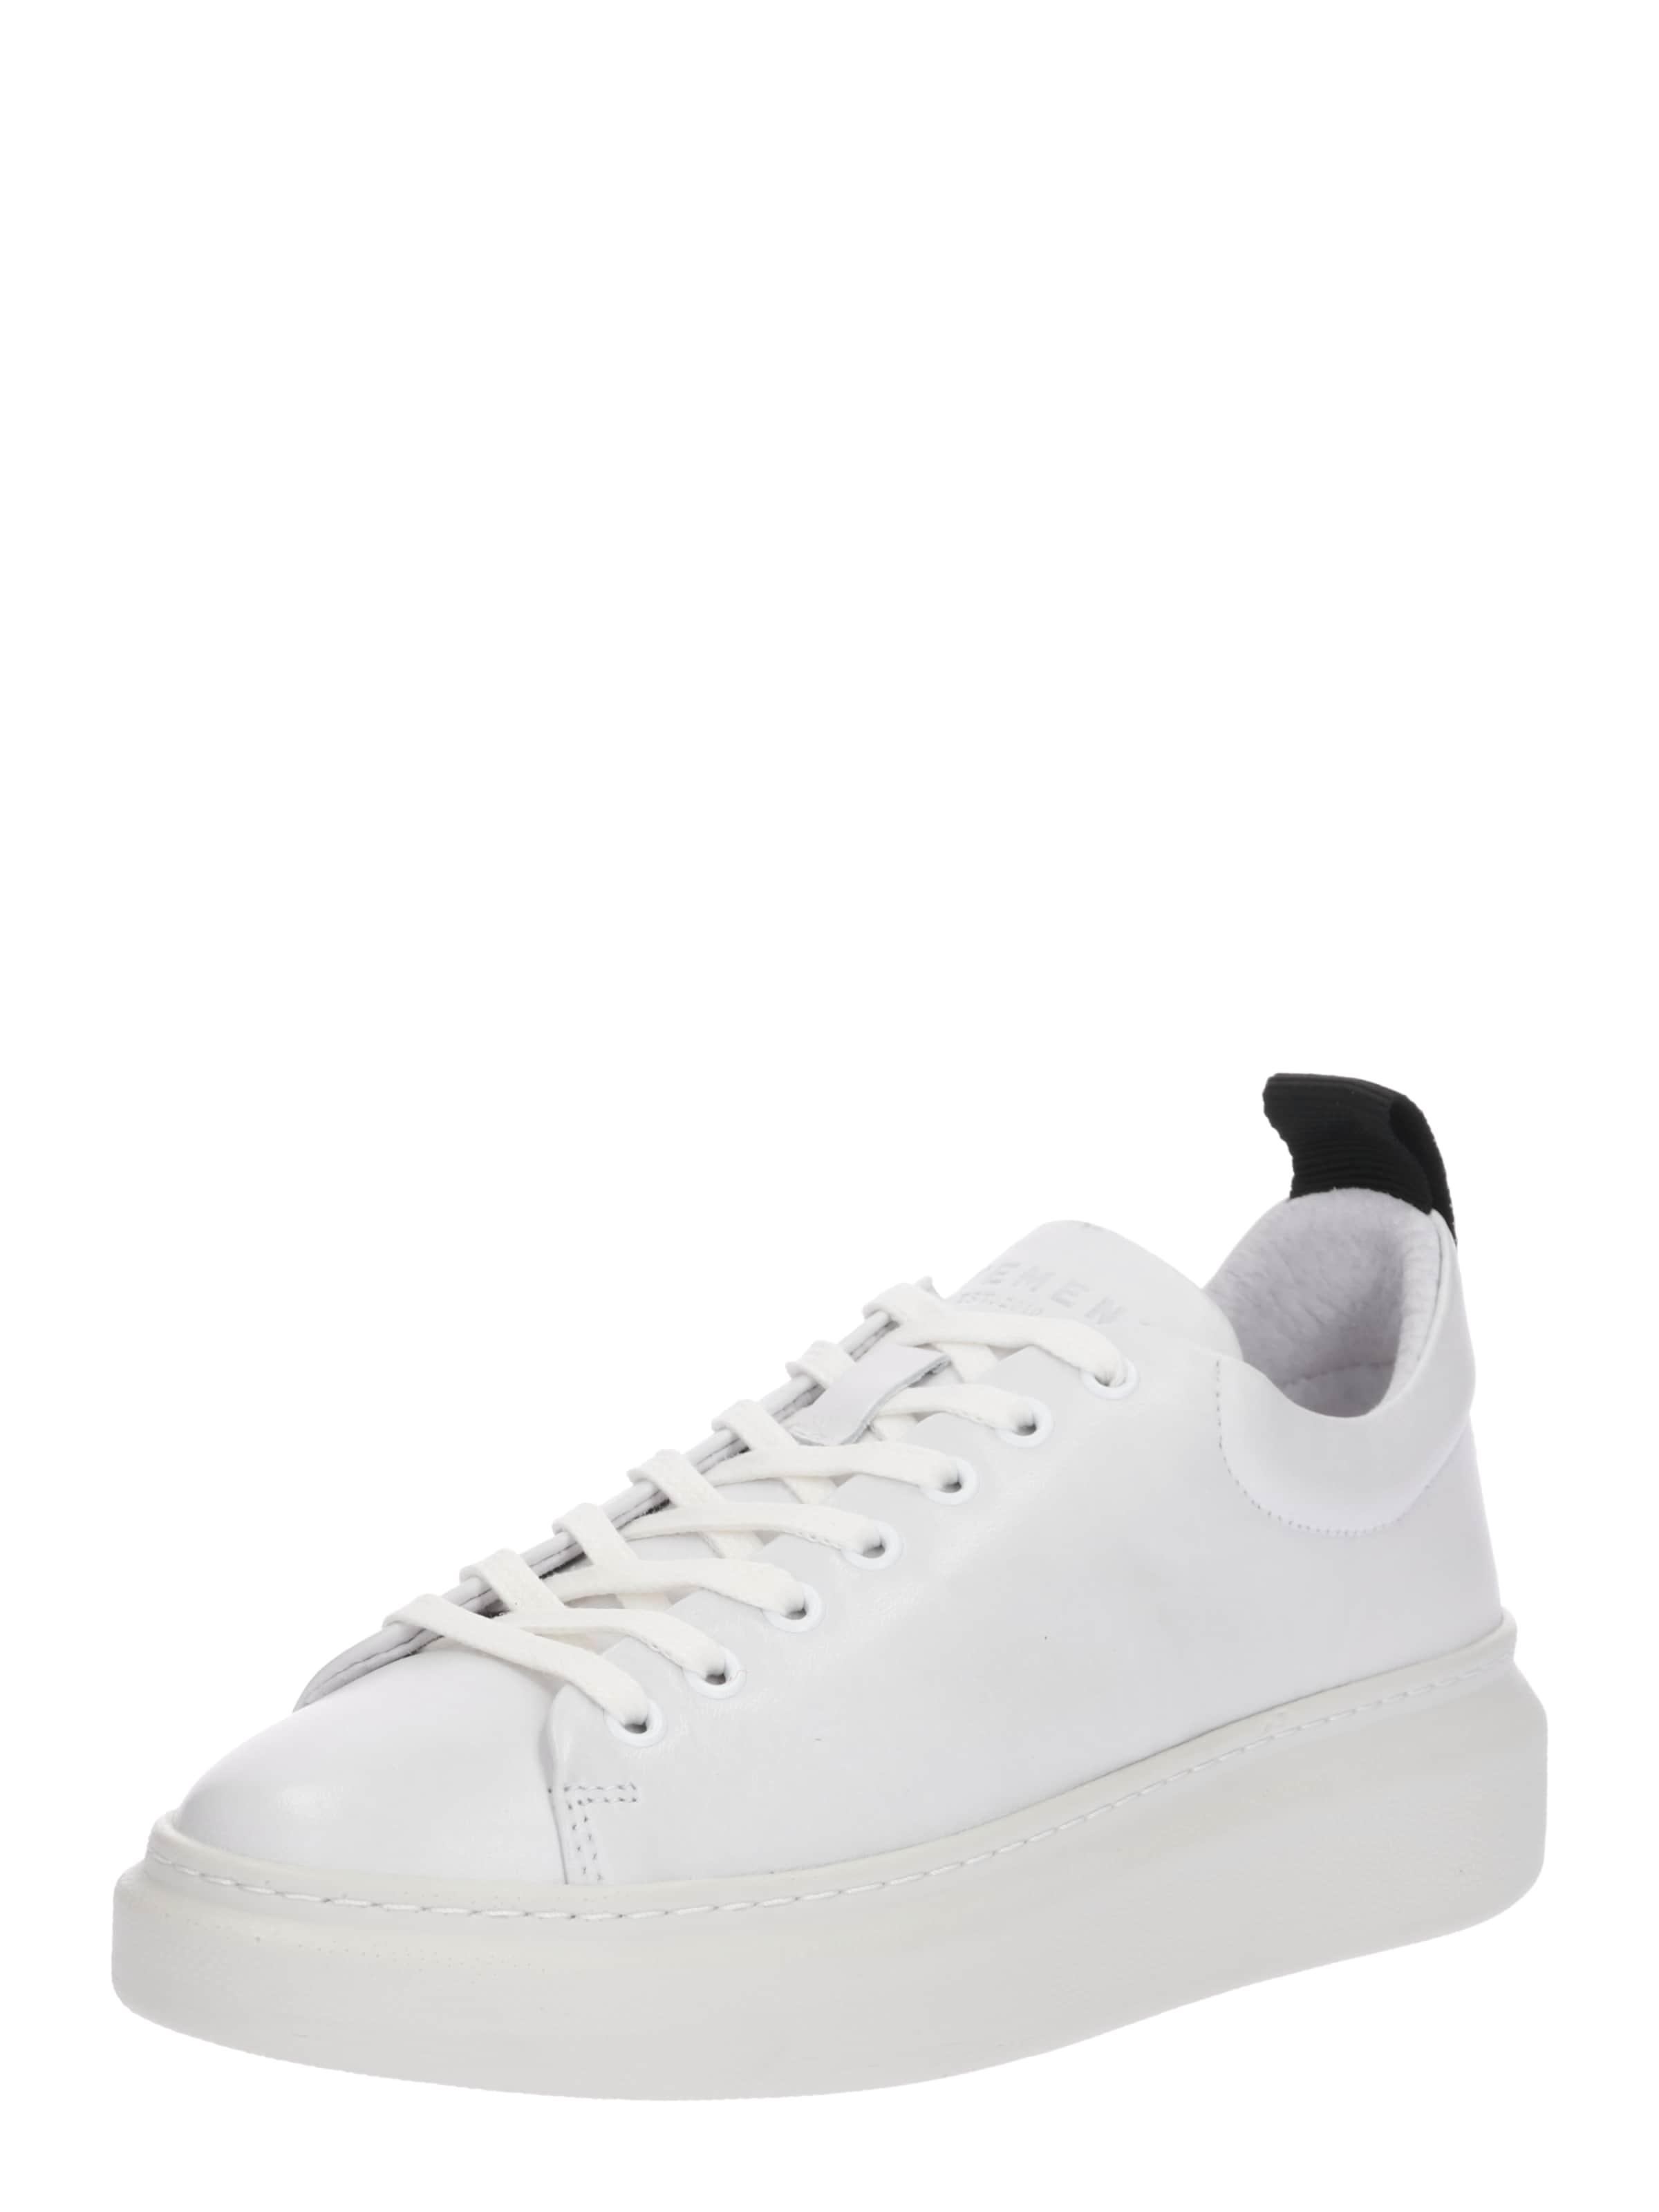 PAVEMENT Sneaker Dee Verschleißfeste Schuhe billige Schuhe Verschleißfeste 86c45e